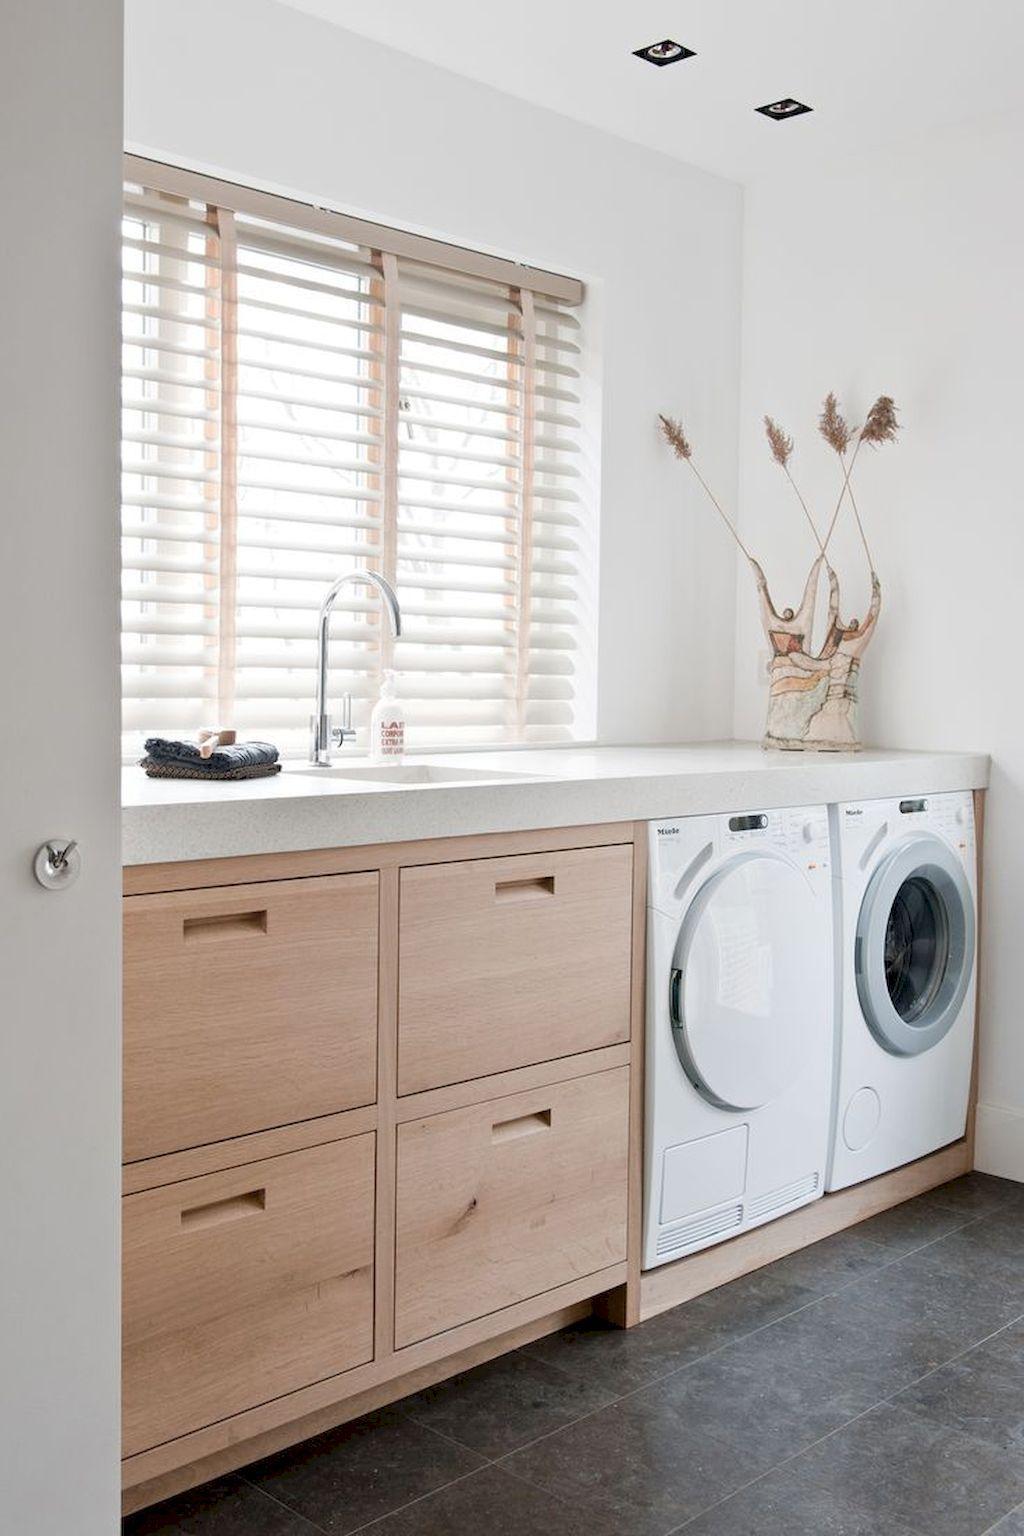 60 Gorgeous Scandinavian Interior Design Ideas Interiores ~ Lavar Cortinas Blancas Muy Sucias